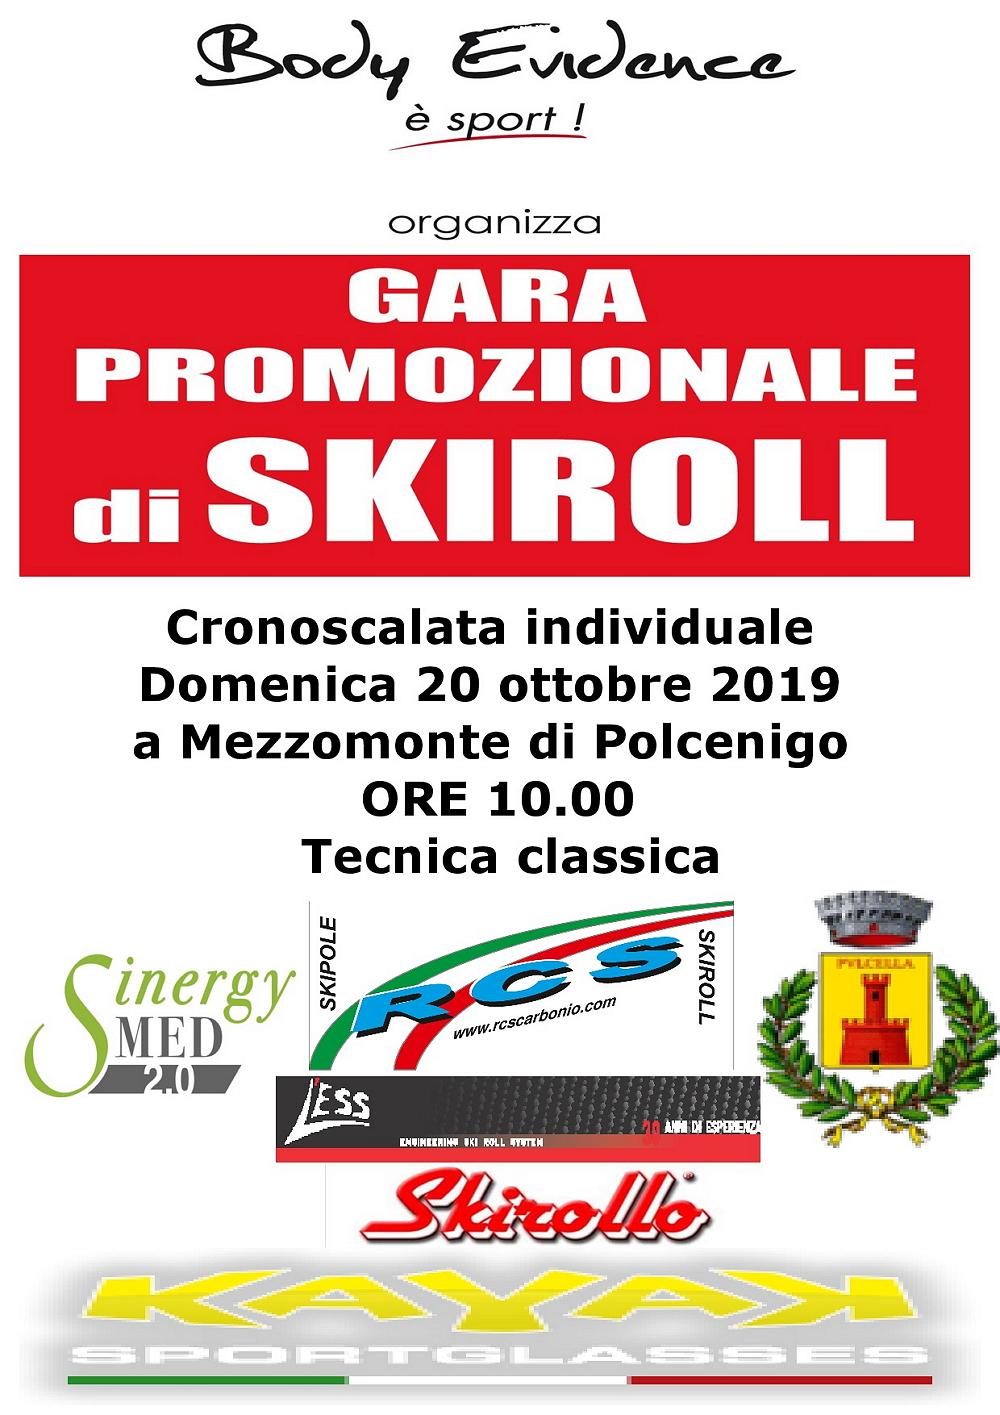 mezzomonte 2019-001jpg